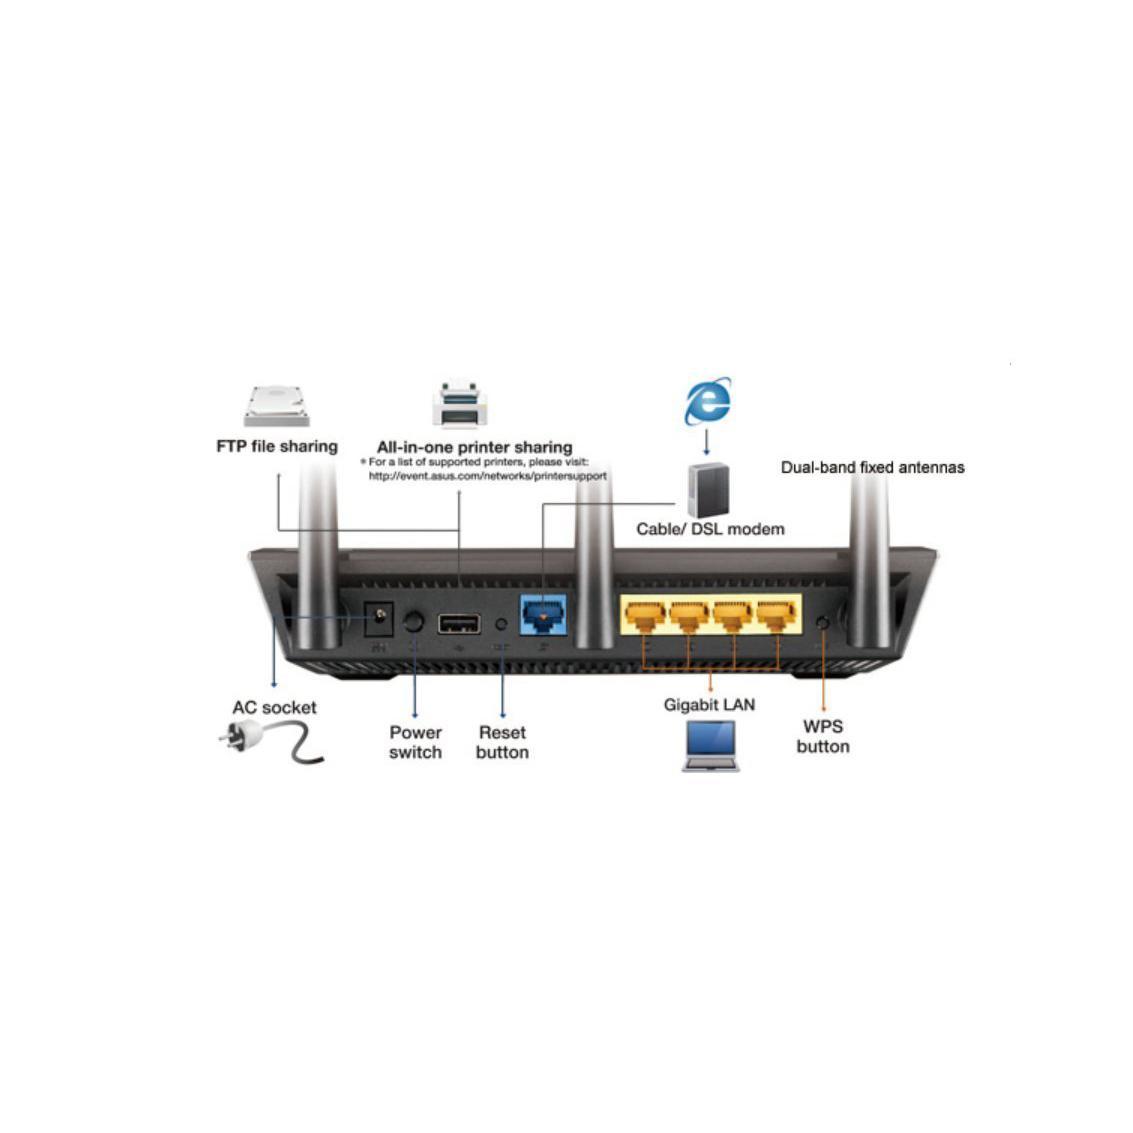 Asus Rt Ac66u B1 Dual Band 3 X 3 Ac Gigabit Wifi